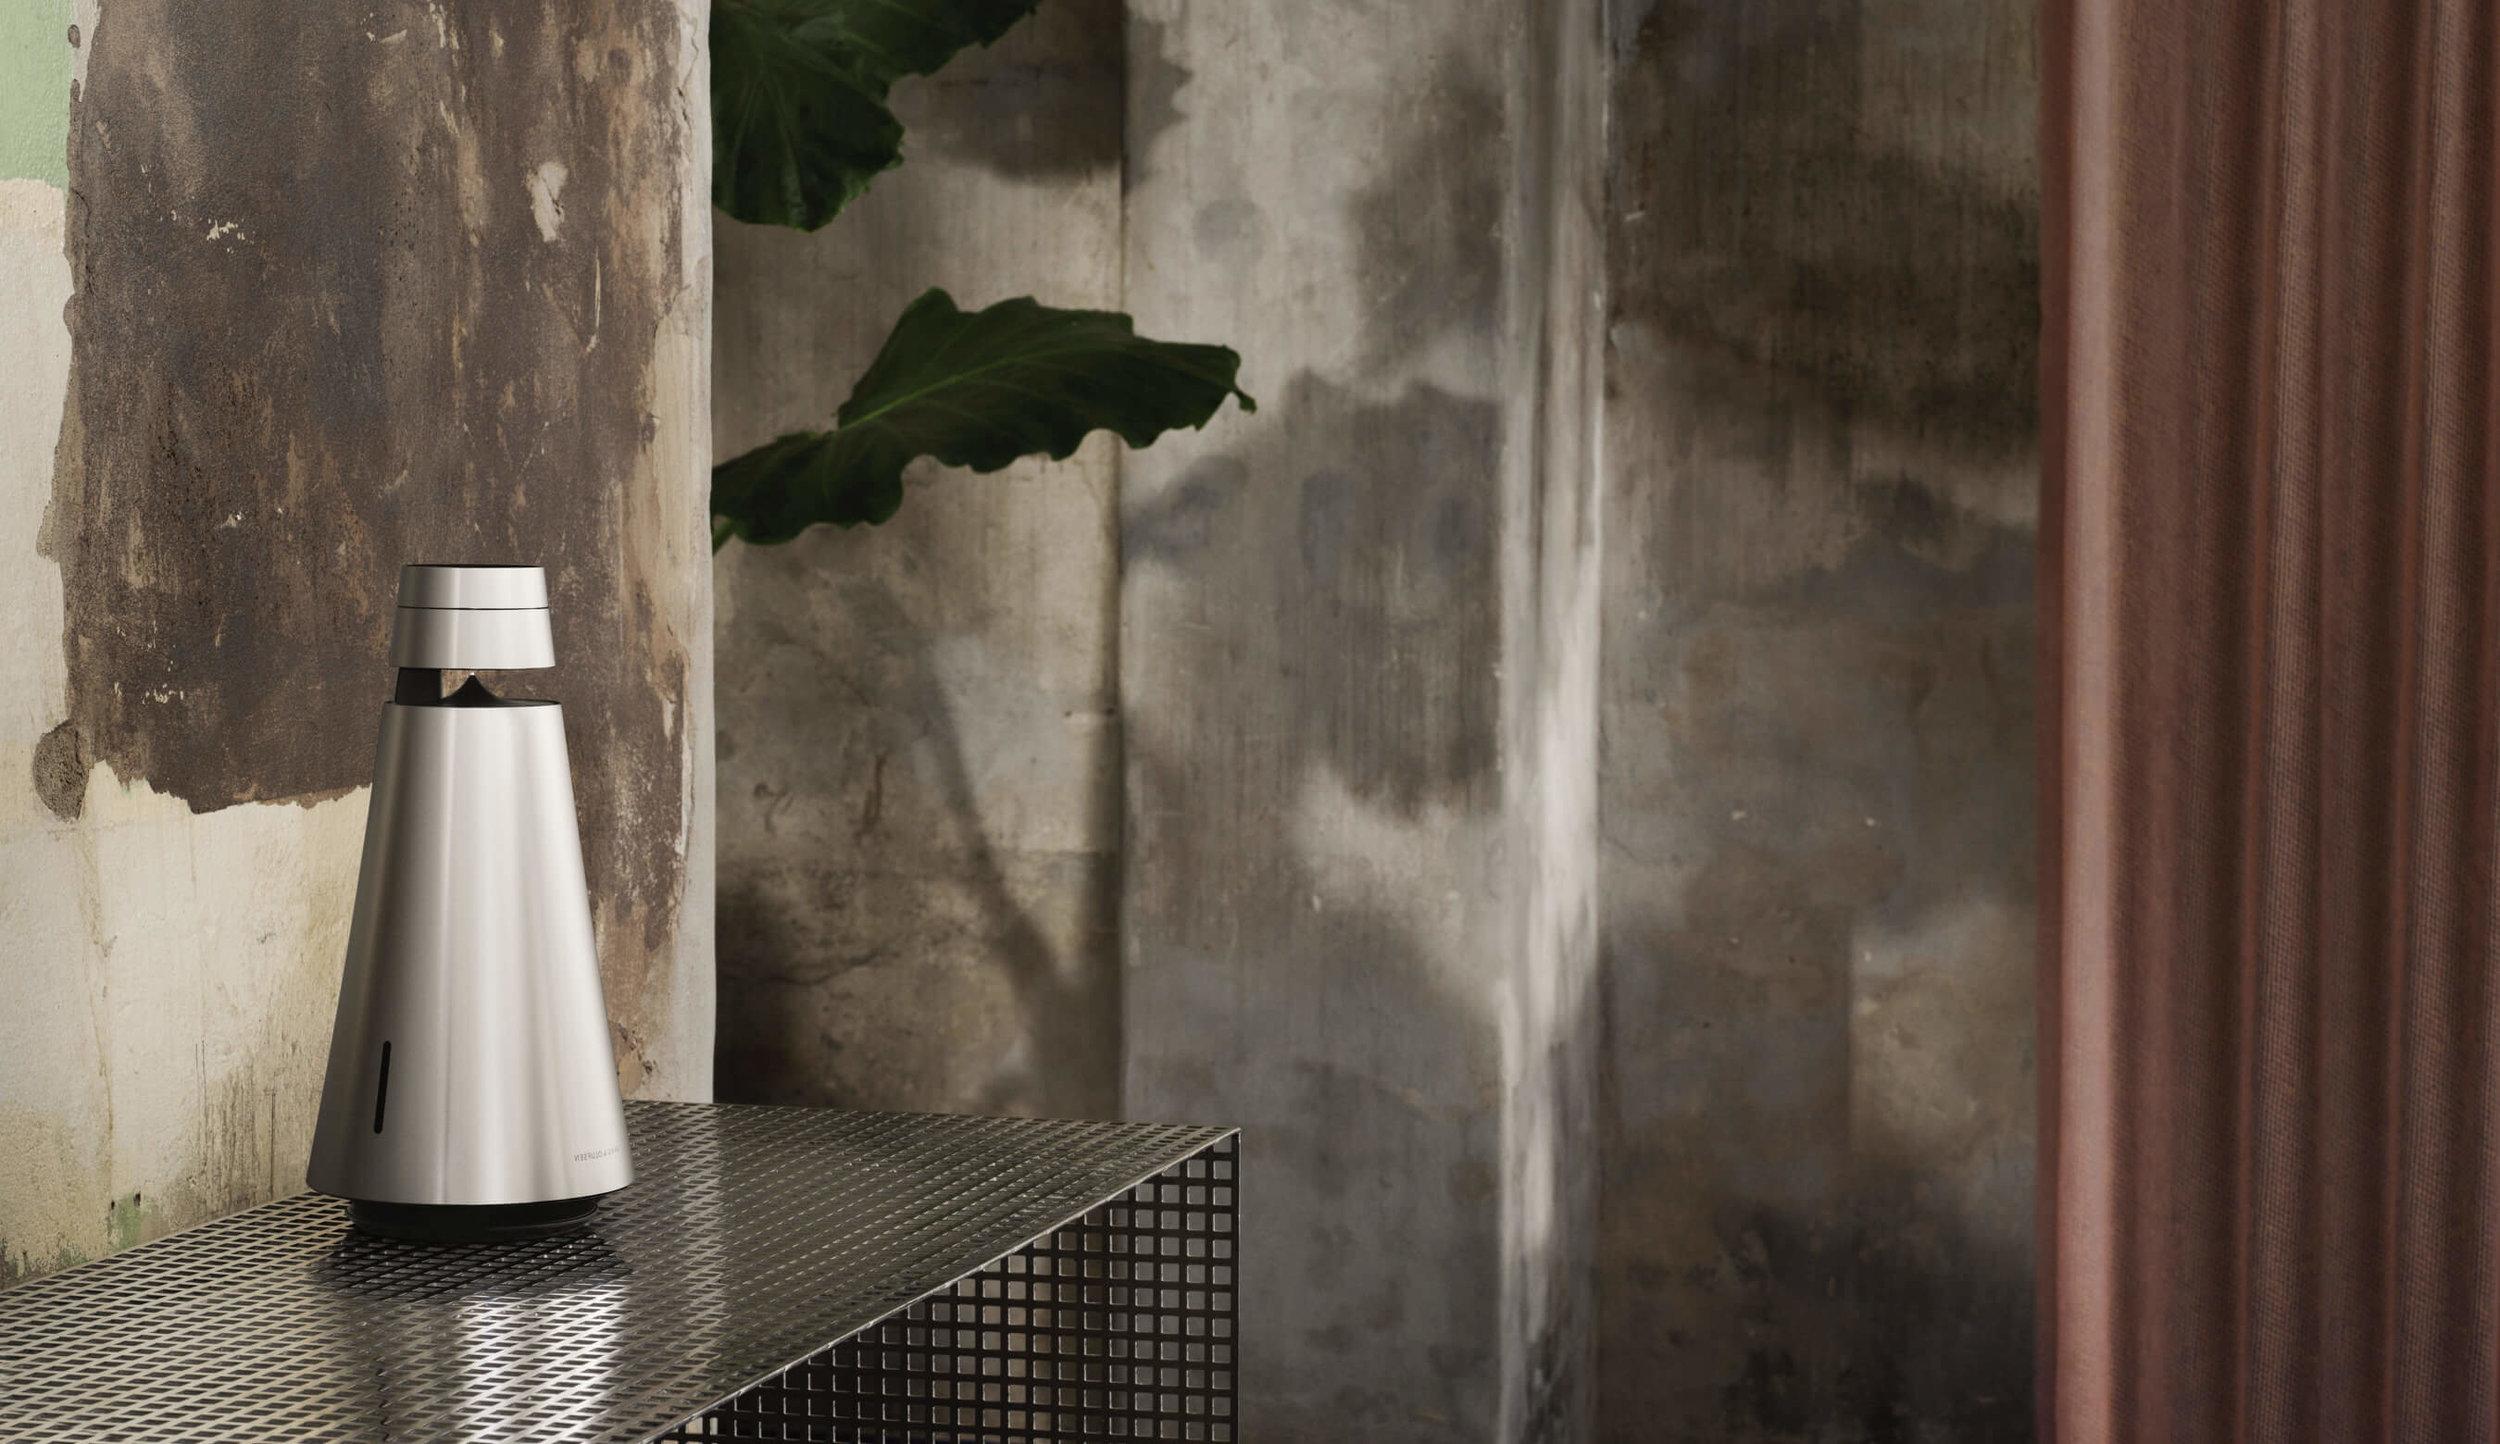 beosound-1-aluminium-in-rustic-home-desktop-bang-olufsen.jpg